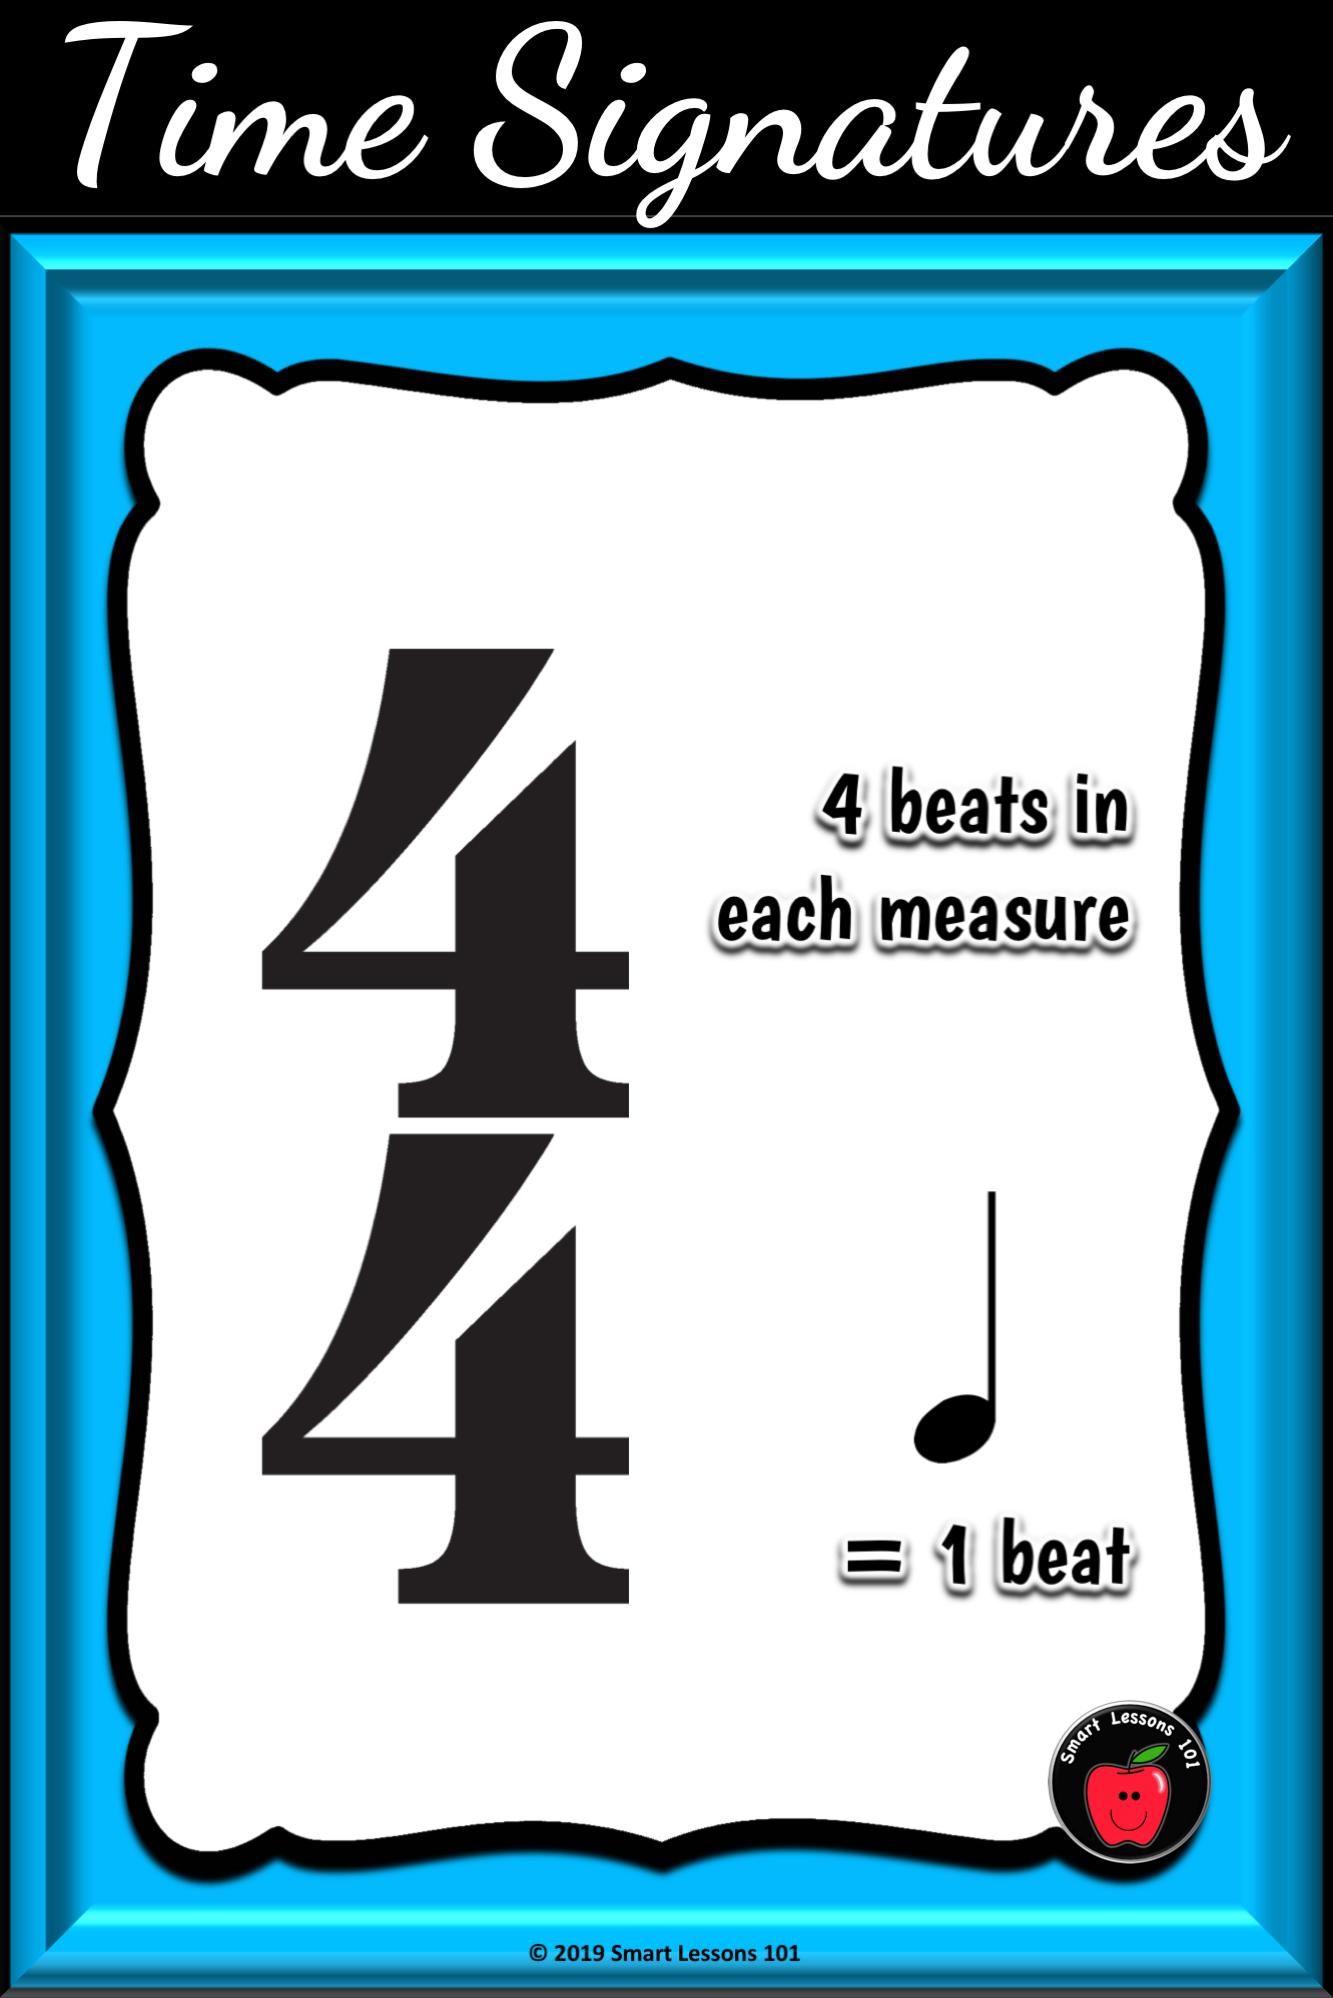 Time Signature Posters Classroom Decor Music Bulletin